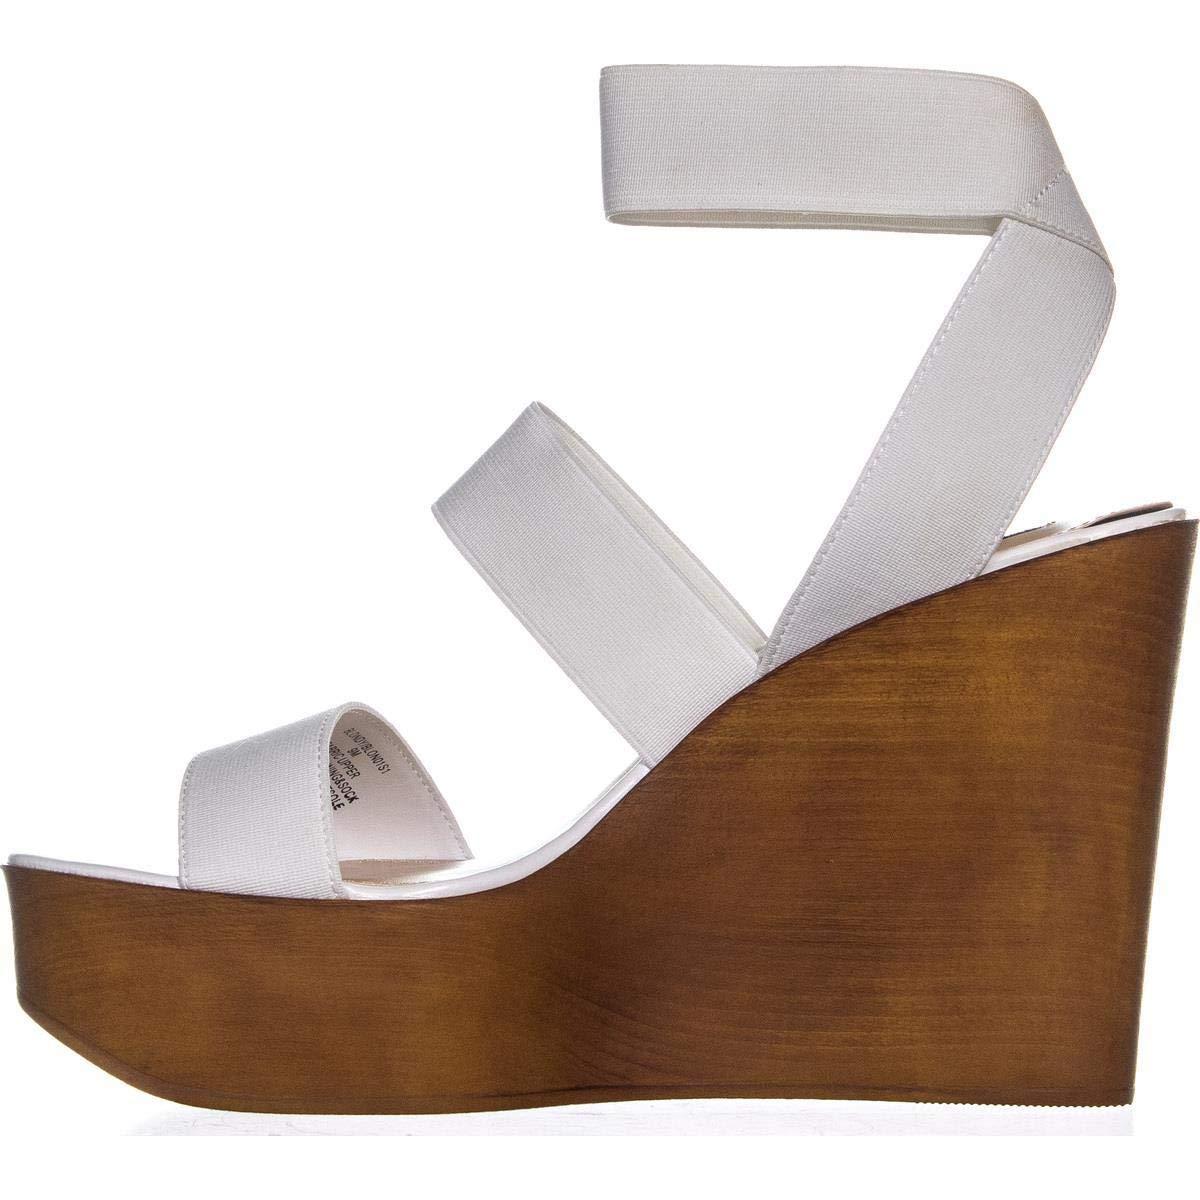 9ec6fcb2aa3d Steve Madden Womens Blondy Open Toe Casual Platform Sandals